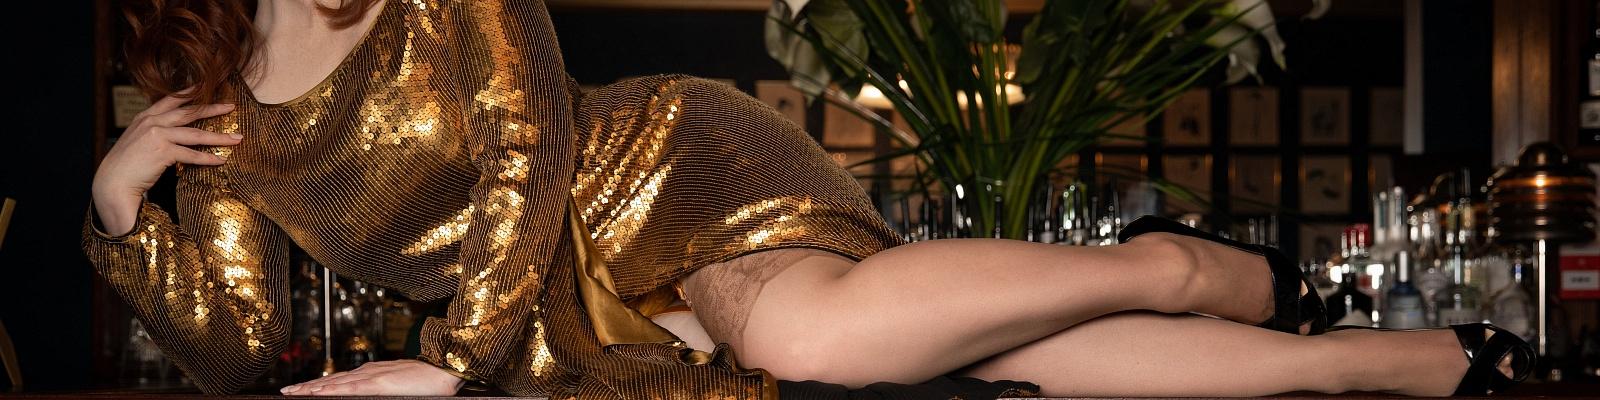 Helena Dawson's Cover Photo